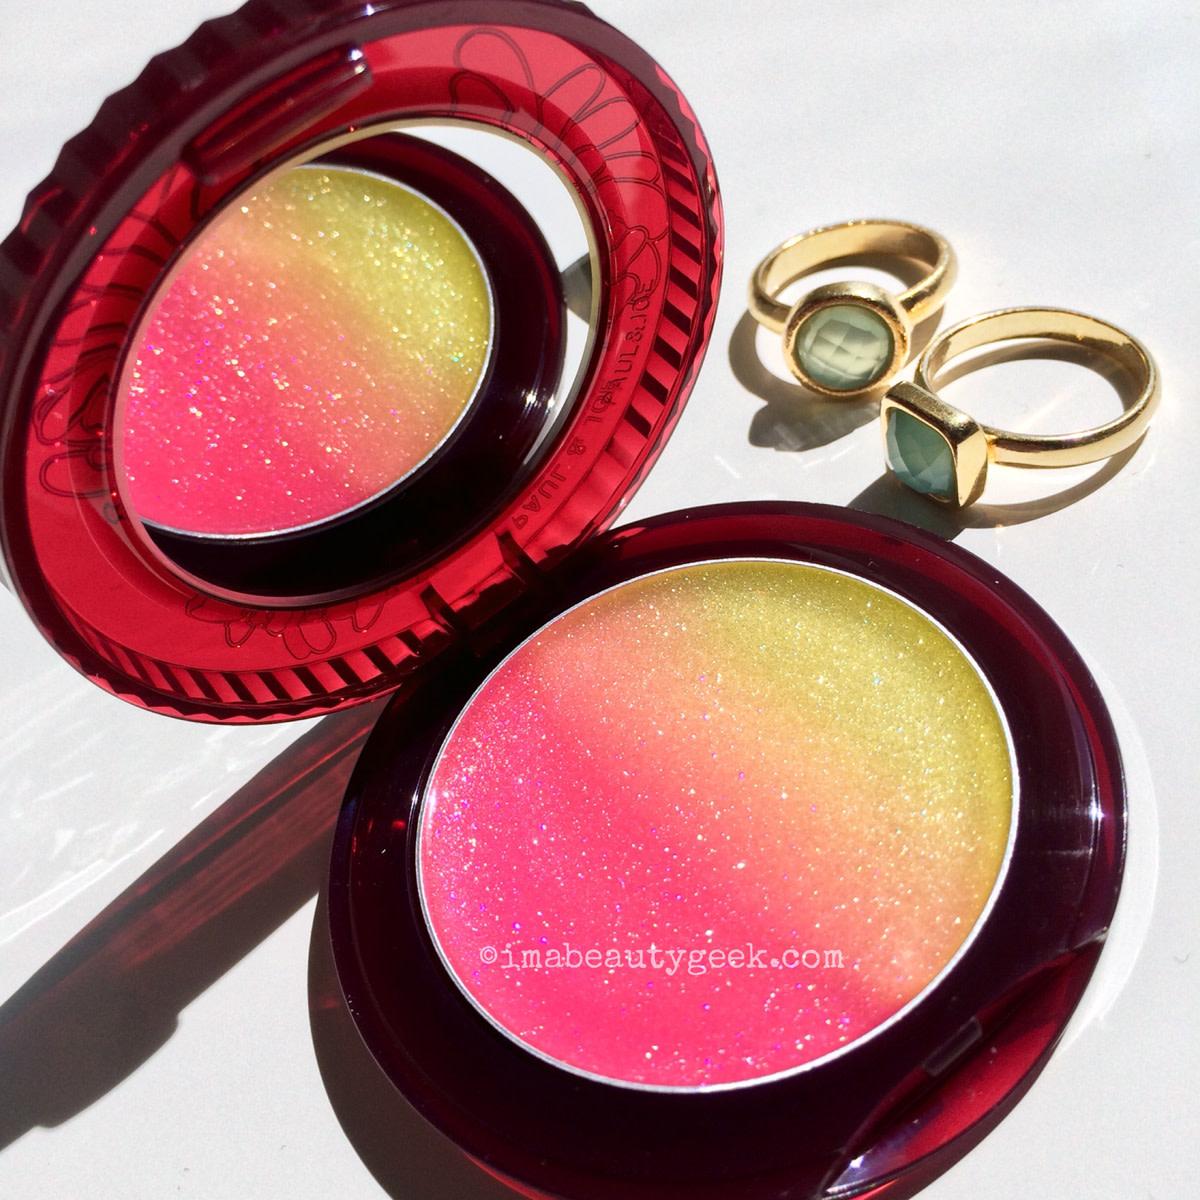 Summer lip gloss: Paul & Joe Midnight Sangria lip gloss M 02Strawberry Kiwi